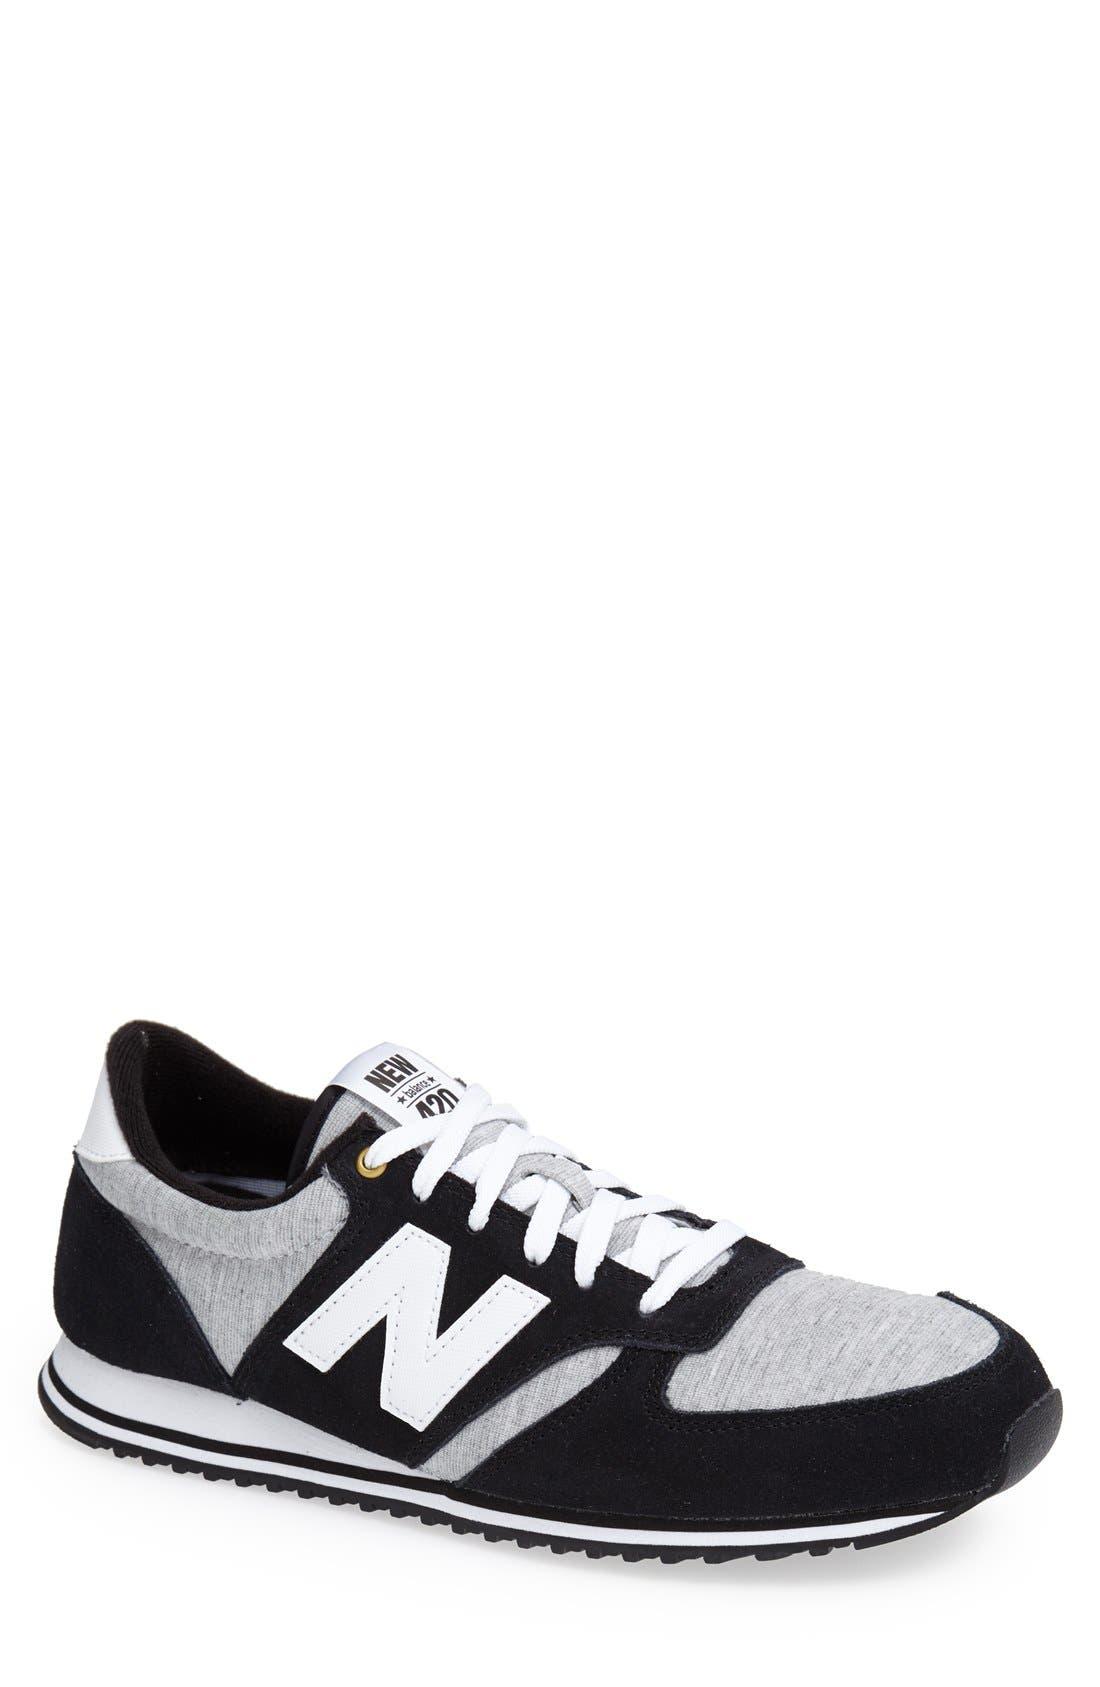 Main Image - New Balance '420' Sneaker (Men)